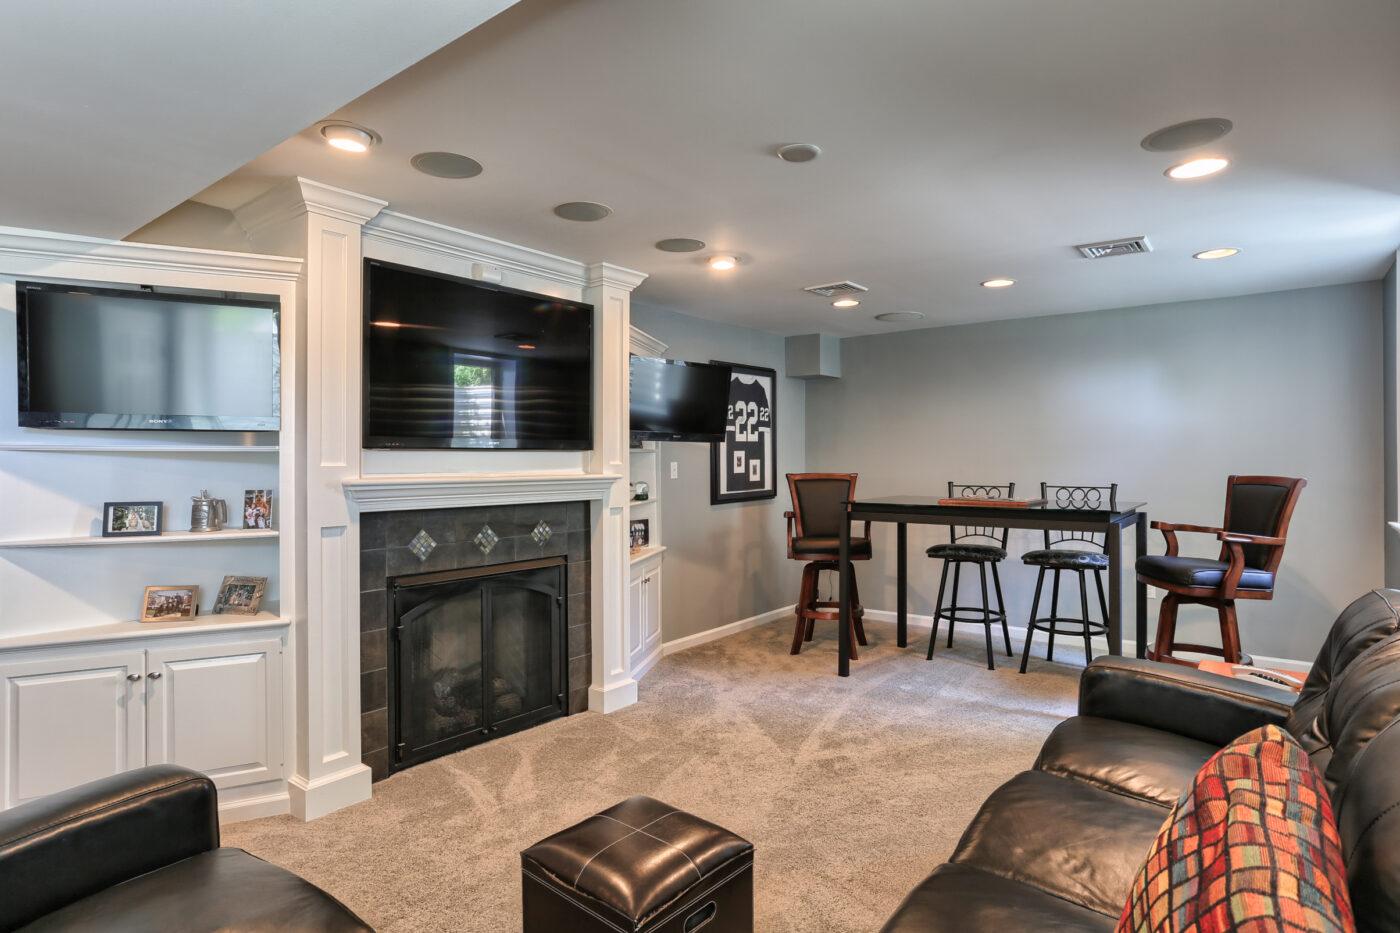 finished-basement-tv-fireplace